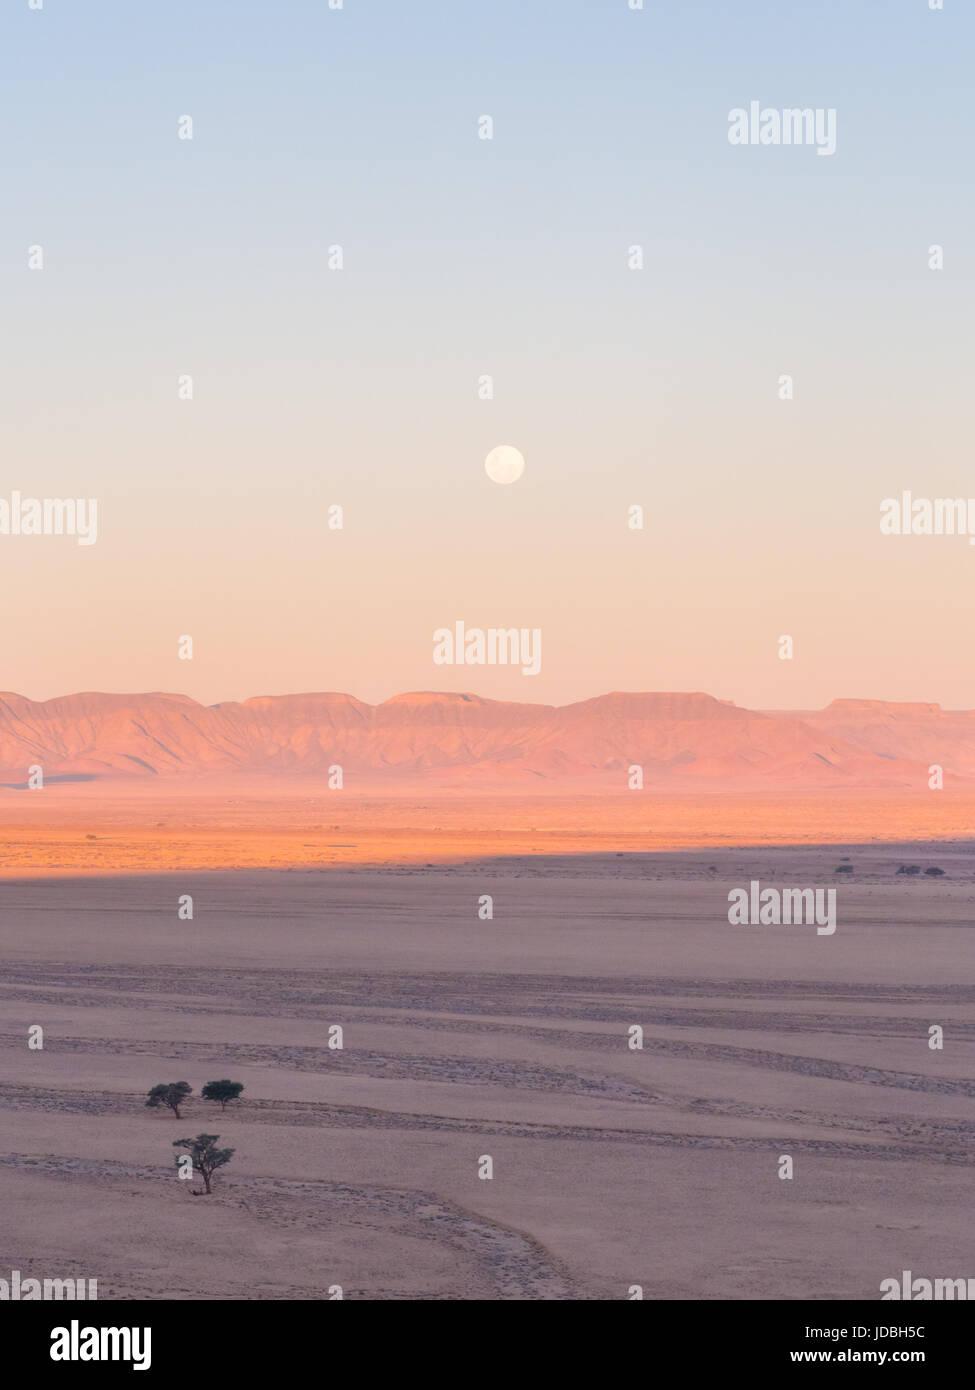 Paisaje el desierto de Namib iones n Parque Nacional Namib-Naukluft, Namibia, Africa, al atardecer. Foto de stock